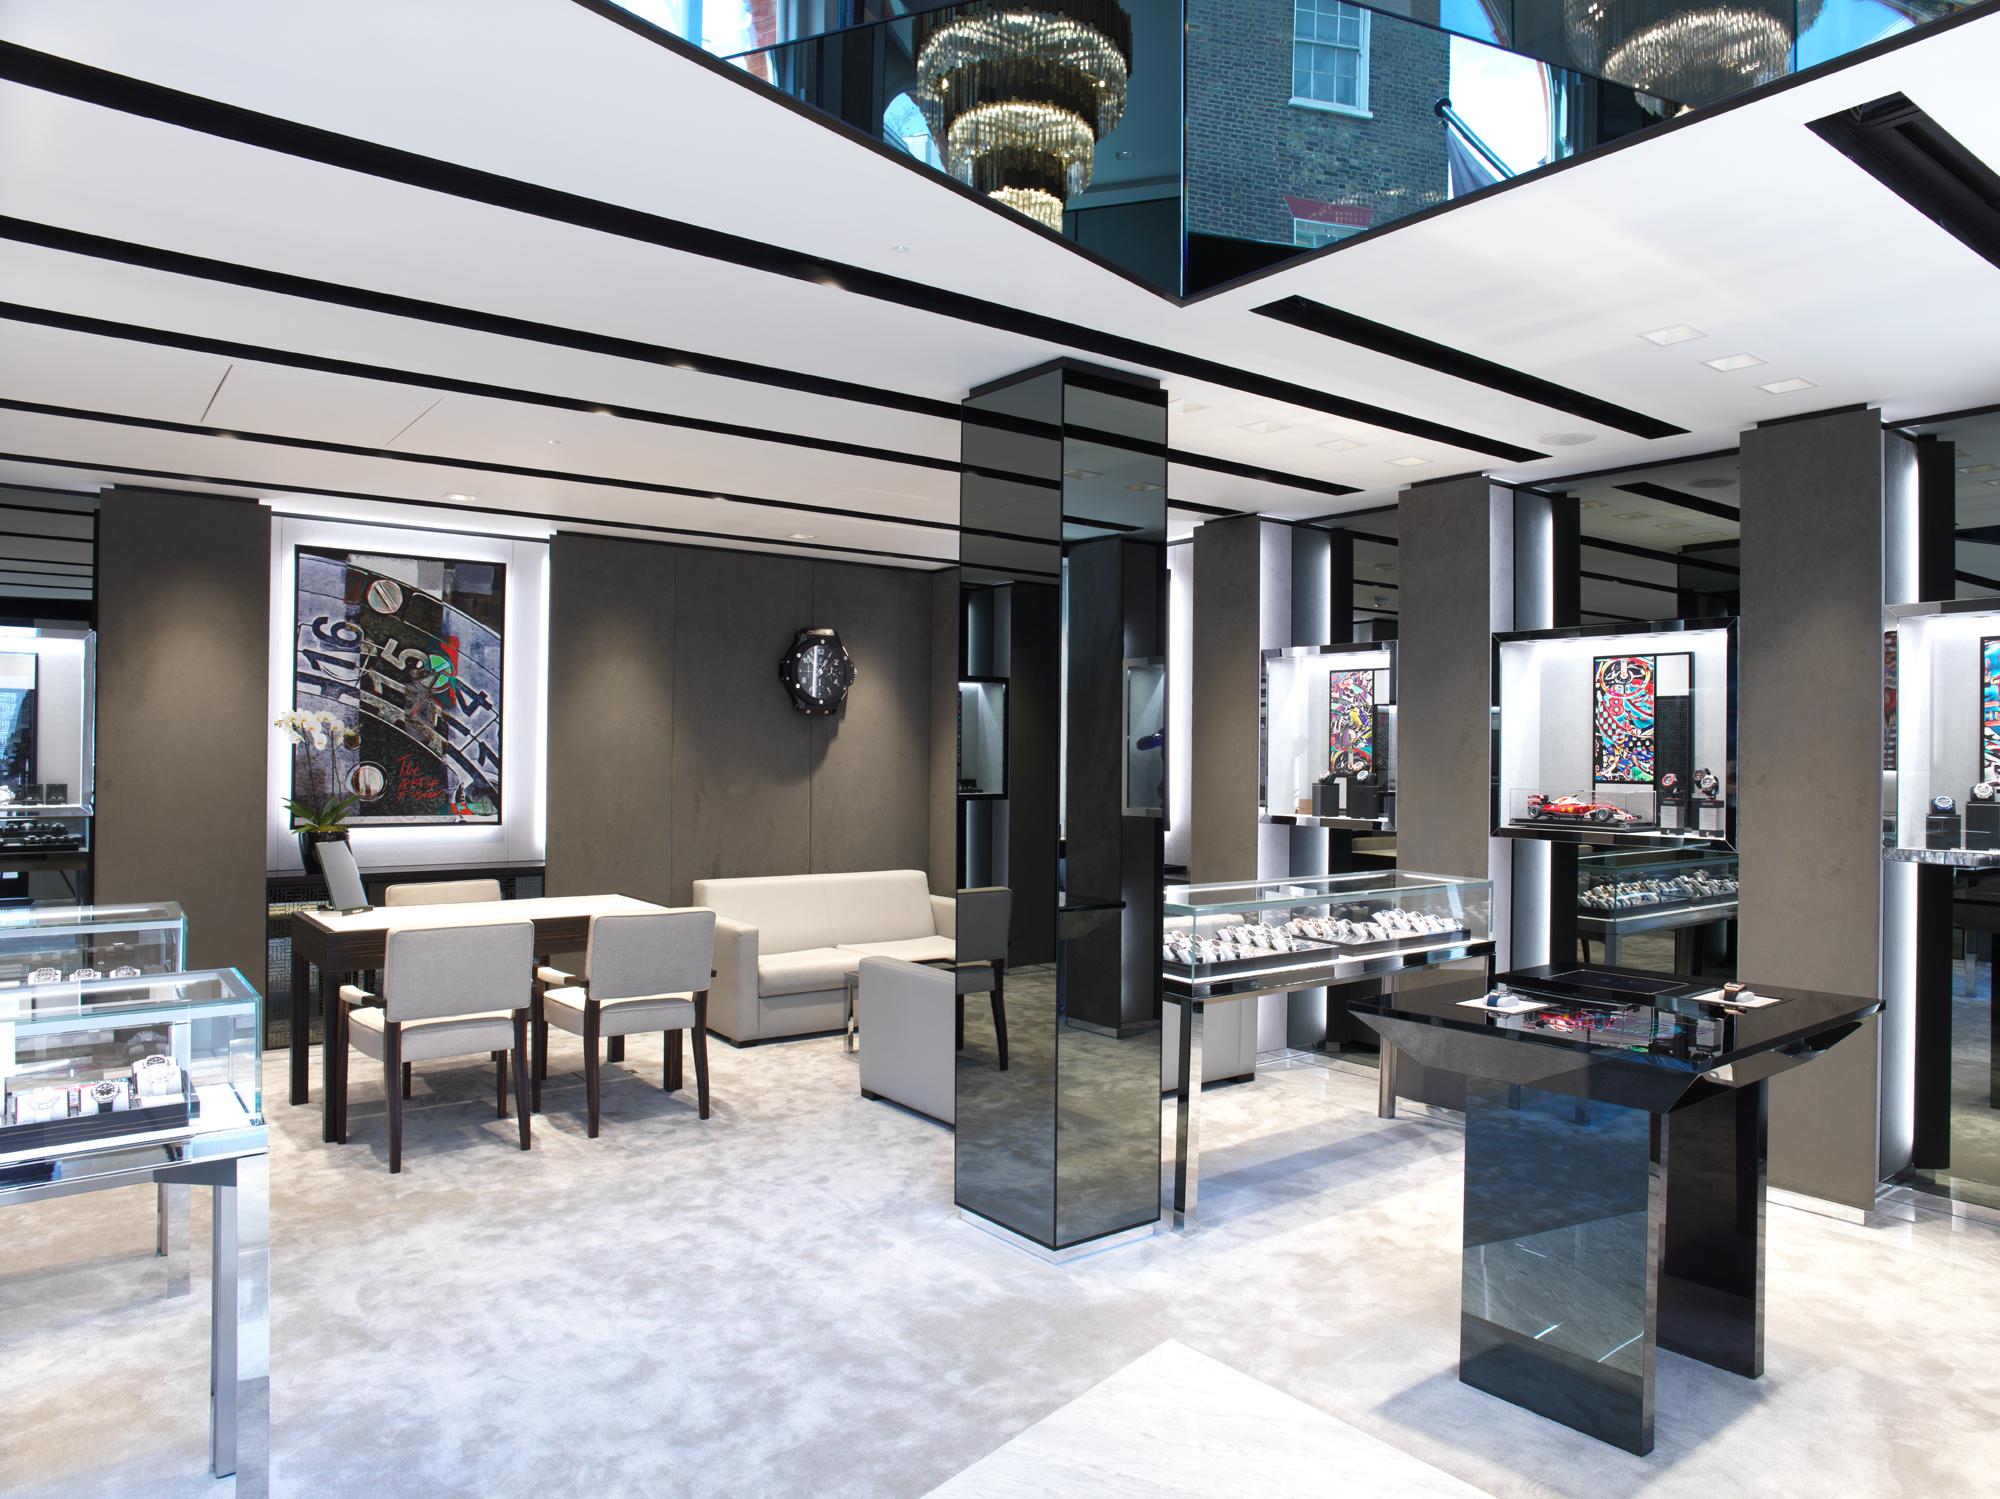 hublot tienda UK - Hublot abre boutique de dos pisos en Londres